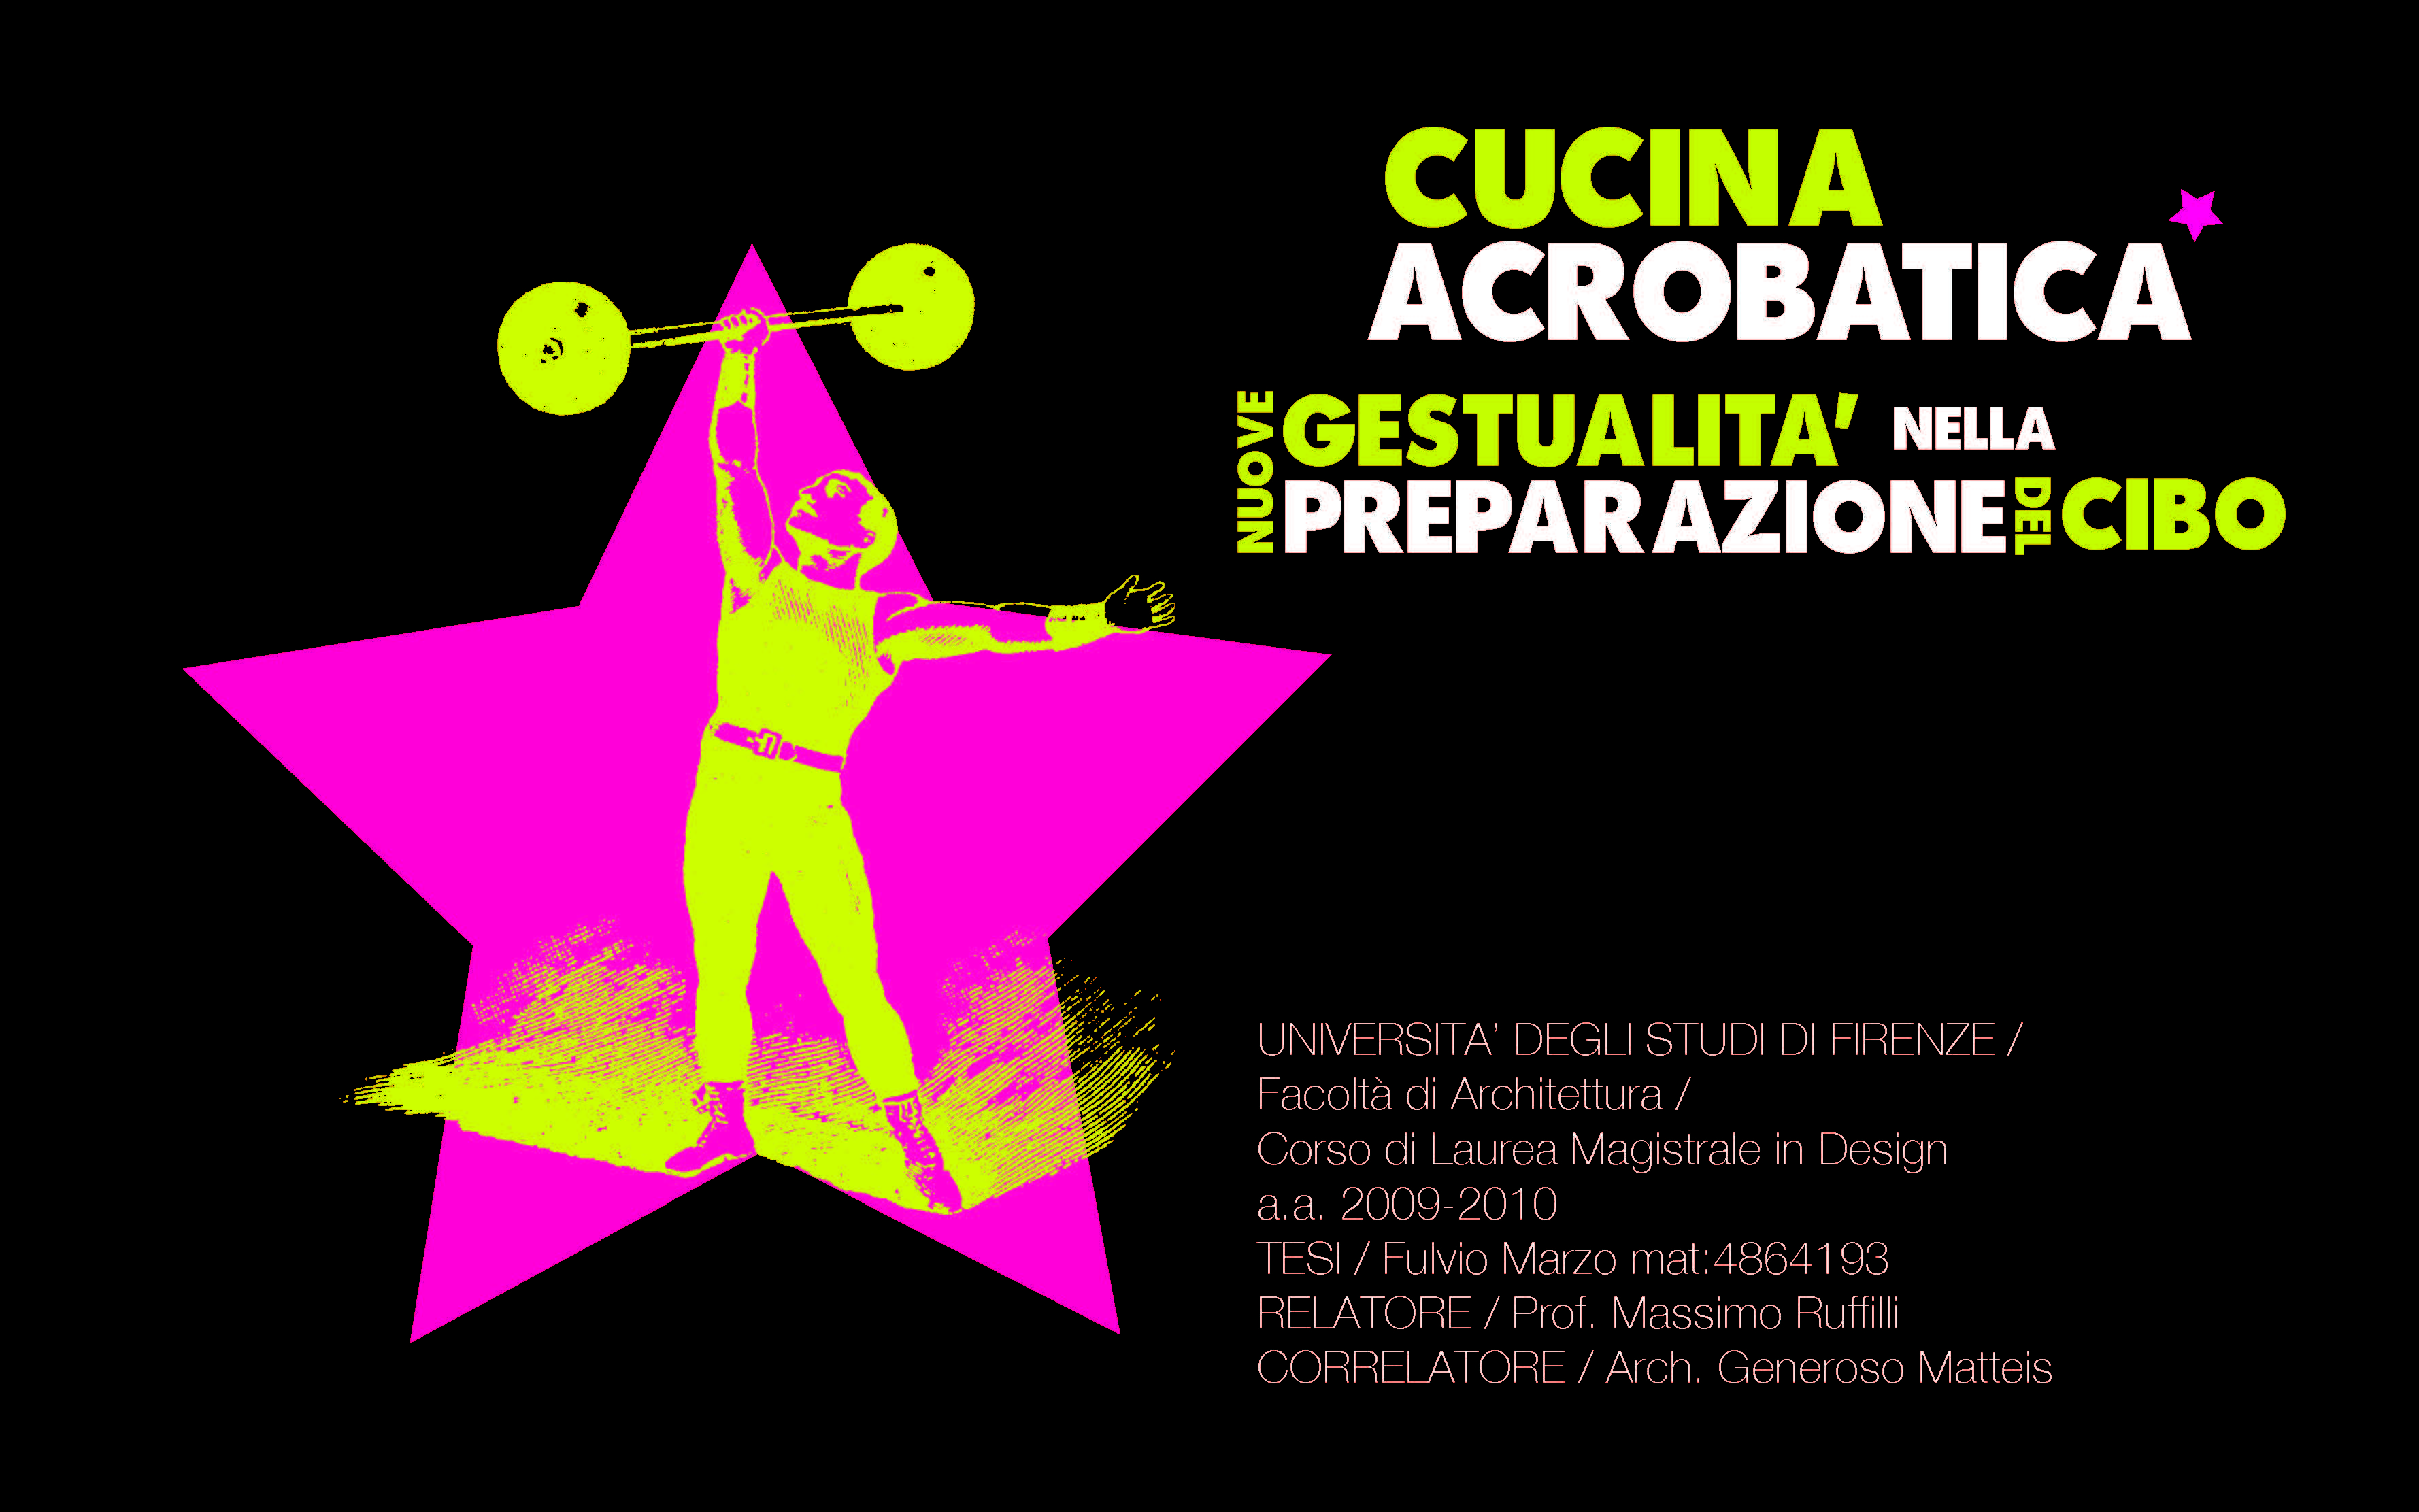 Cucina Acrobatica Almadesign Creative Studio